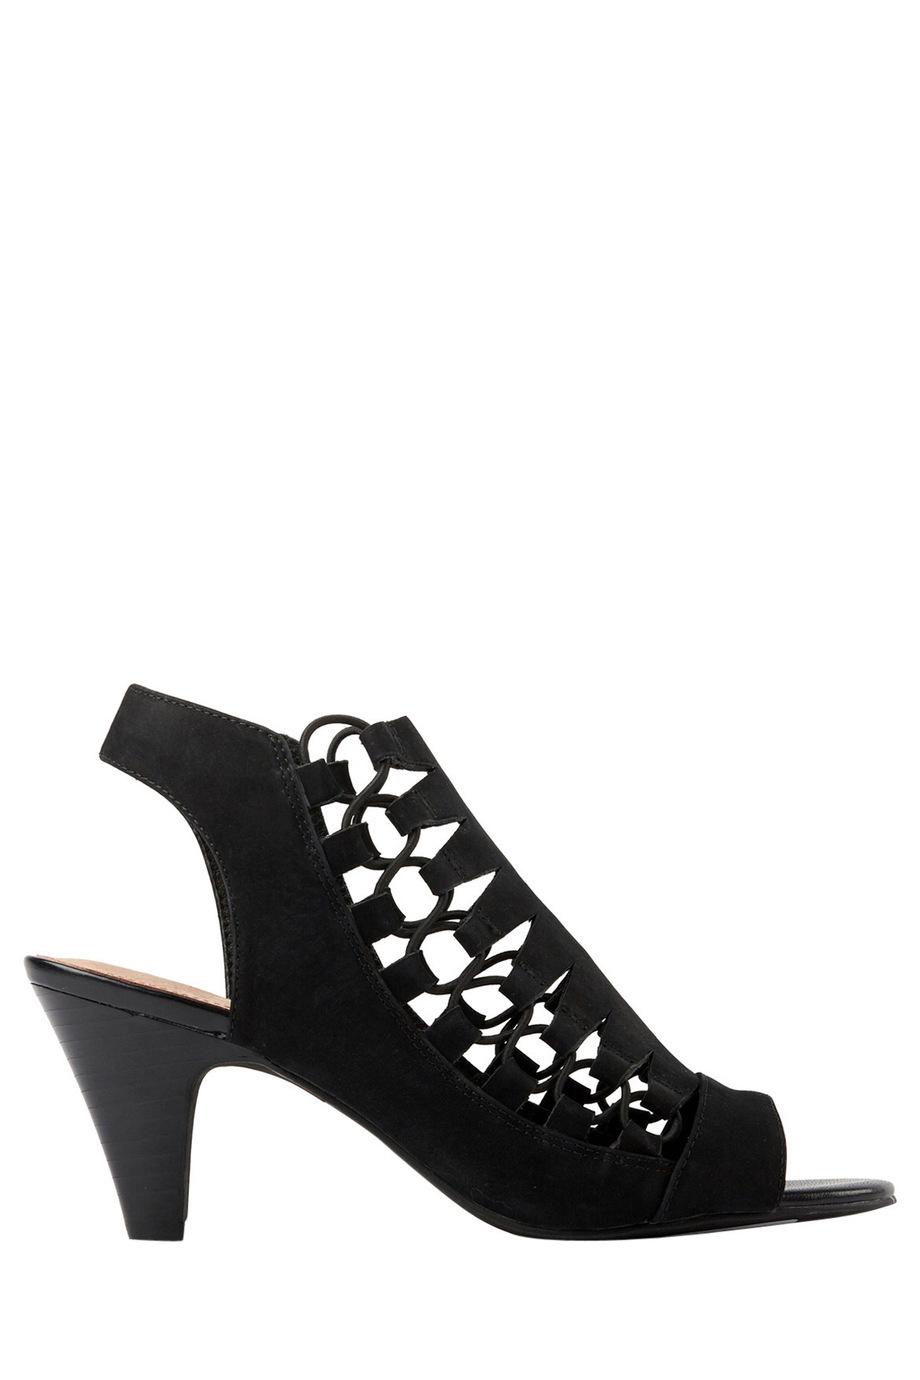 Black sandals myer - Black Sandals Myer 55